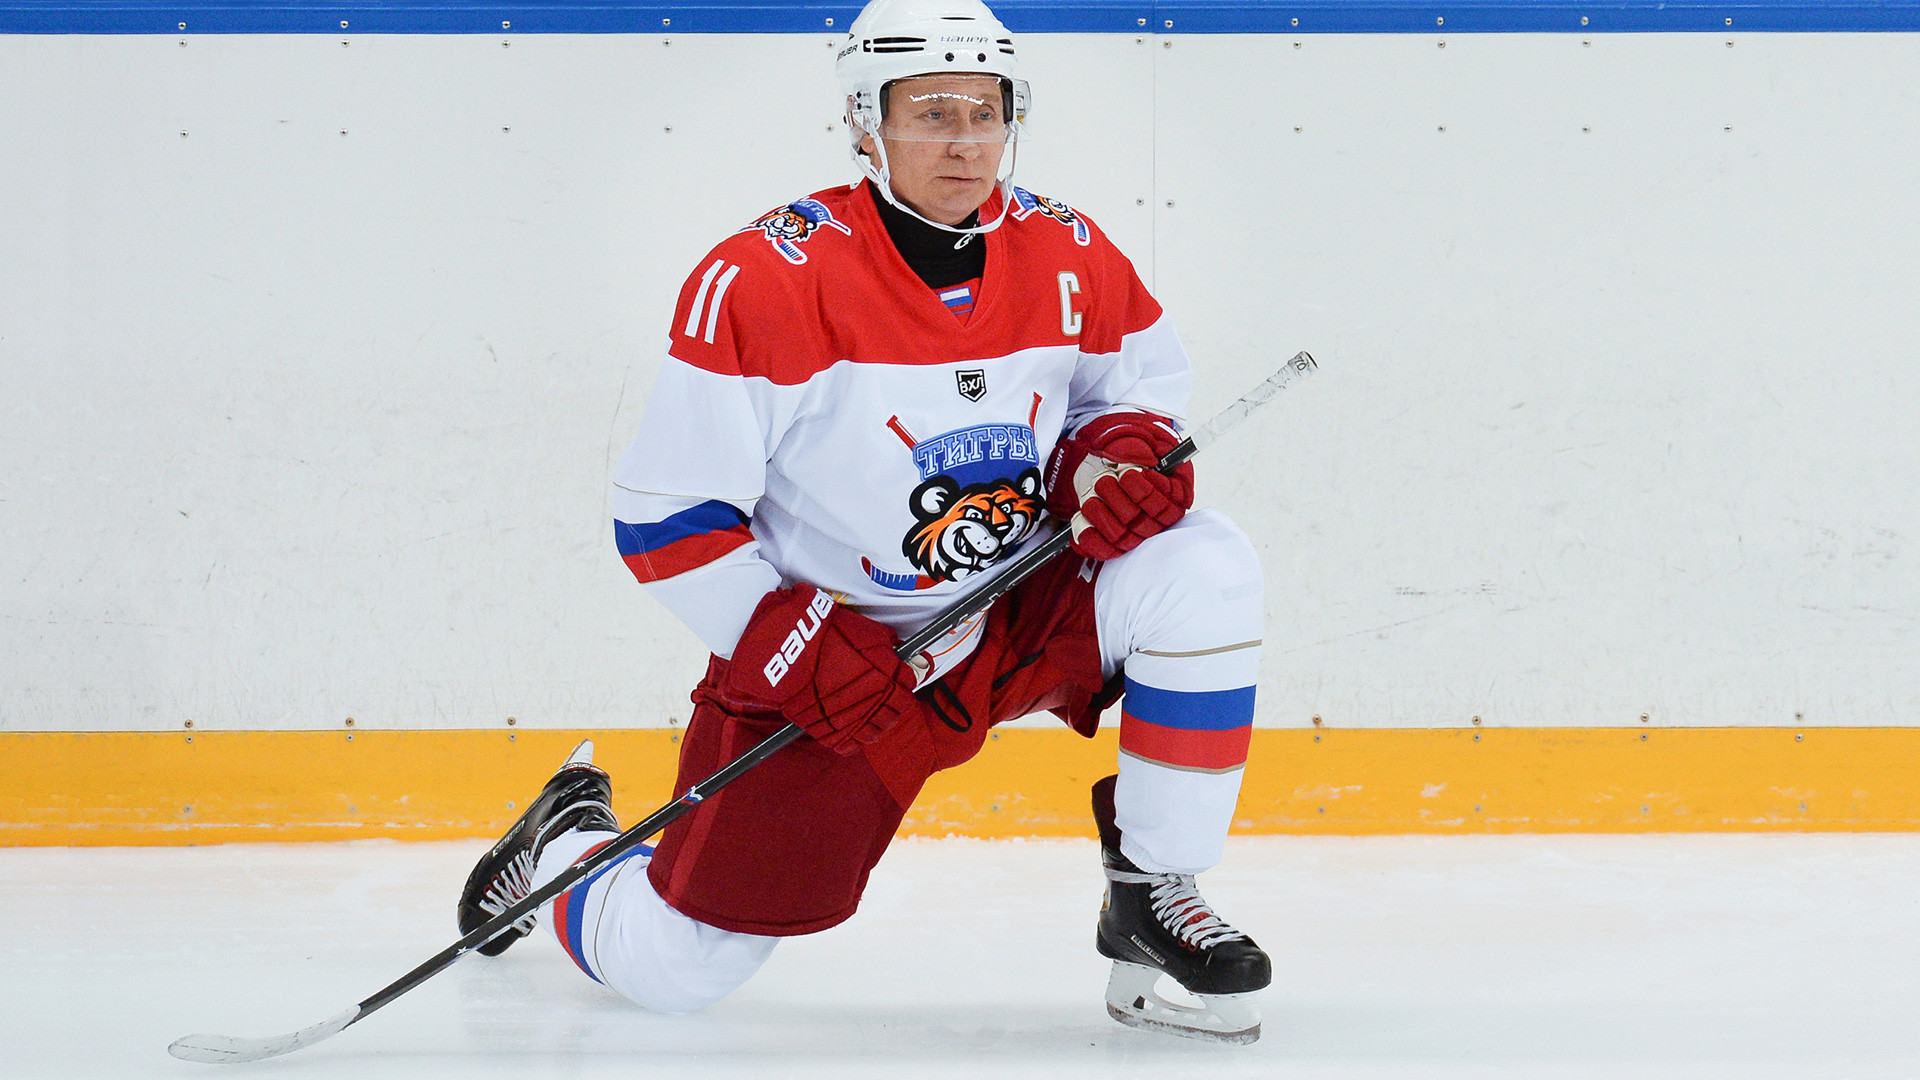 President Vladimir Putin warms up before an ice hockey match, Sochi, 2019